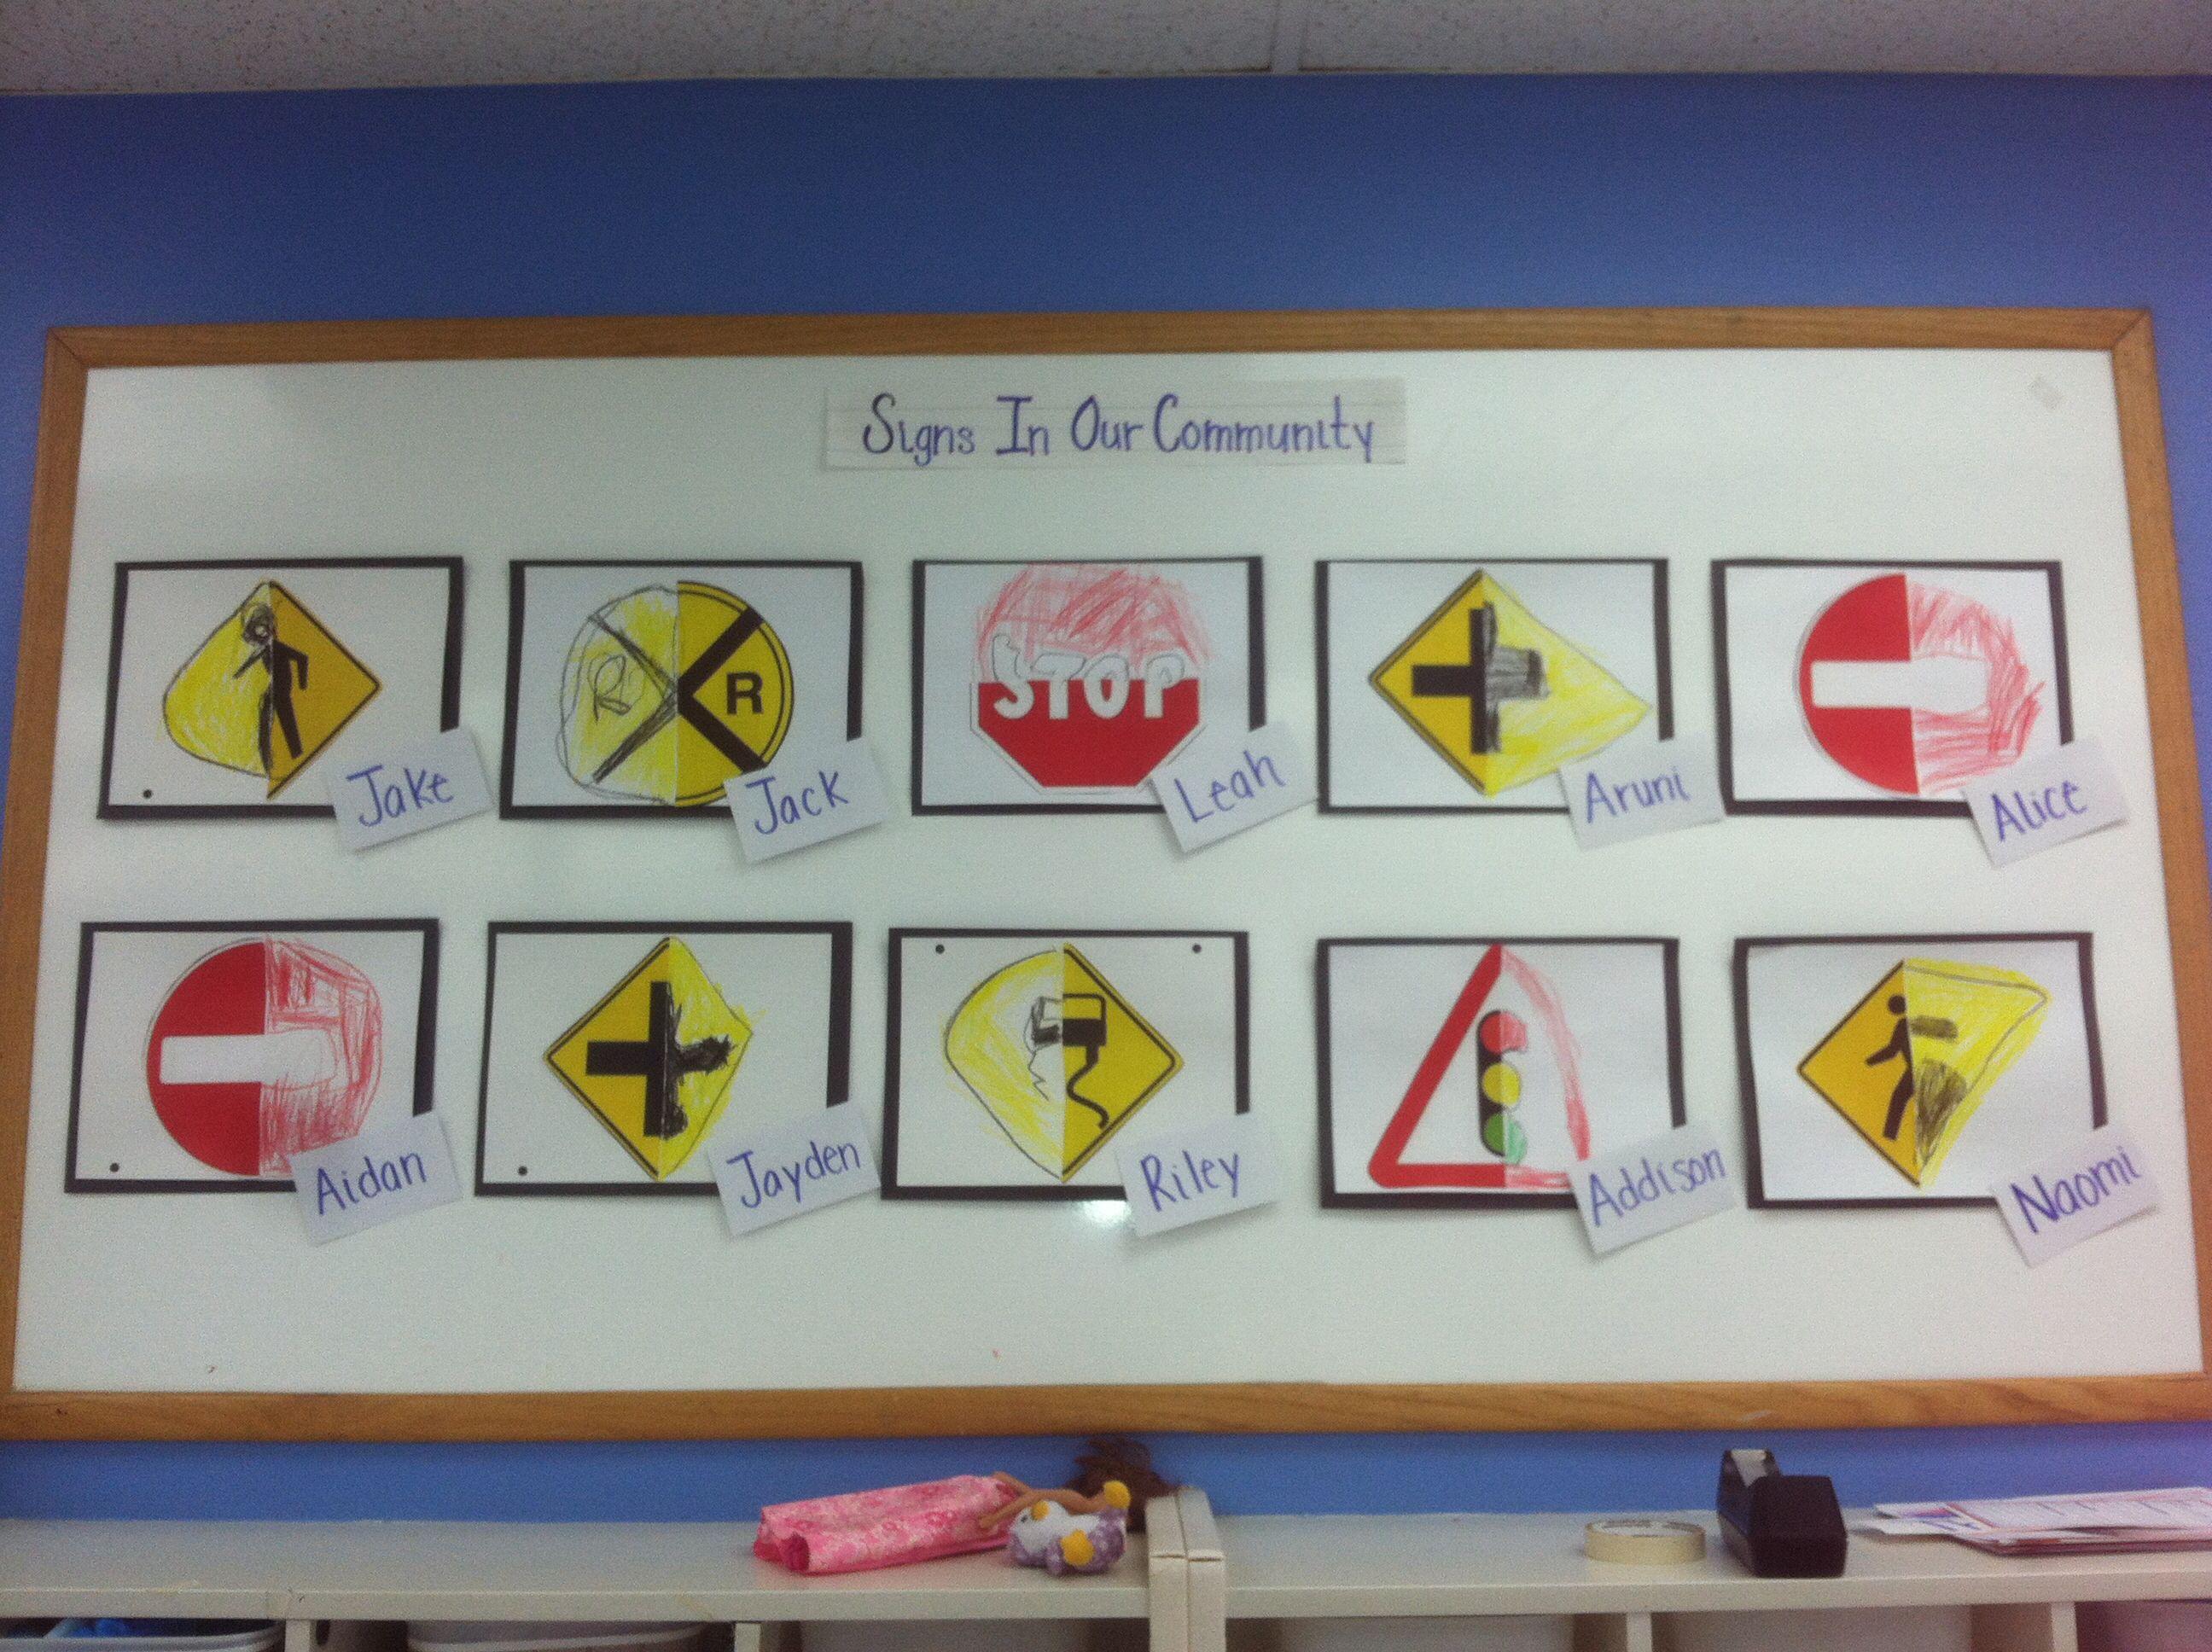 Traffic art projects for preschoolers